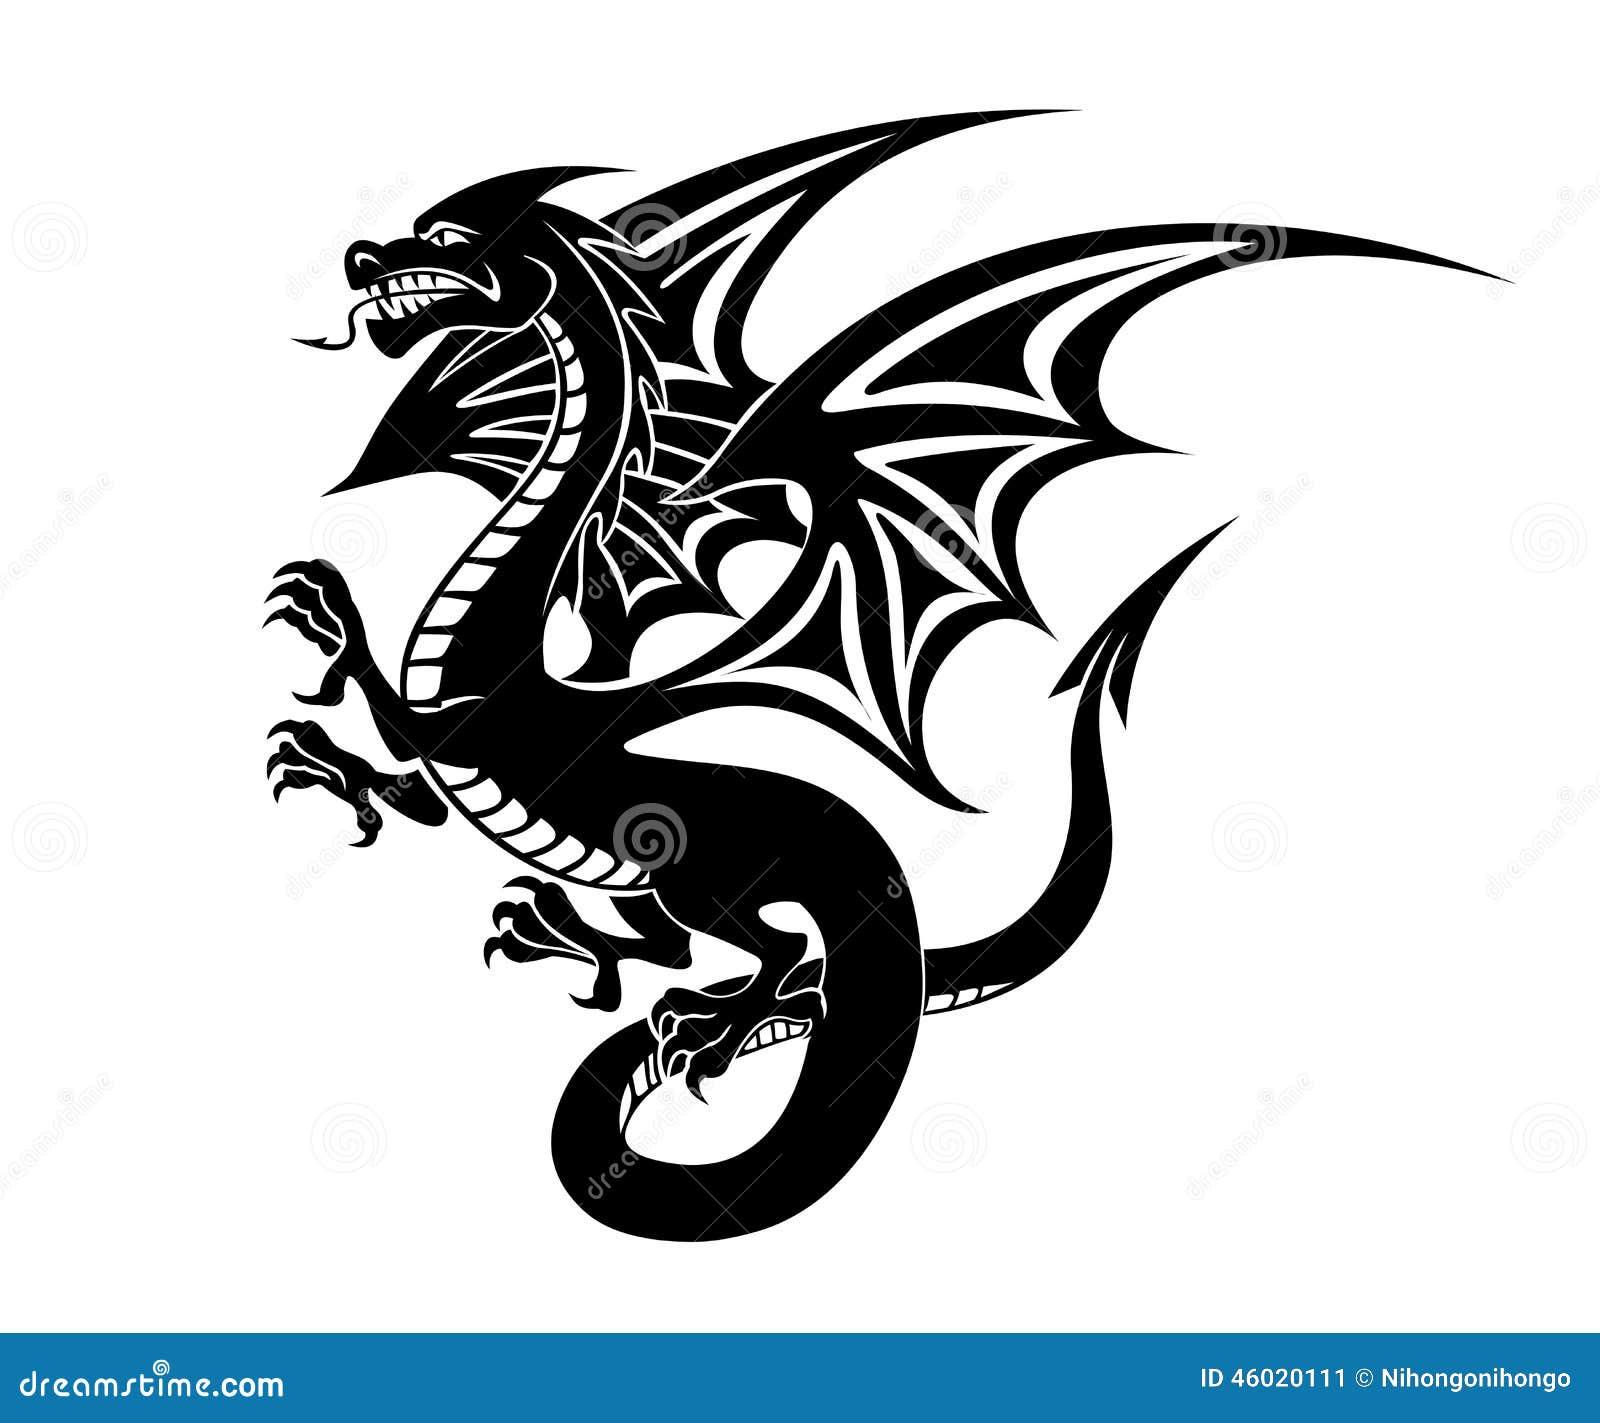 Black Dragon Tattoo Stock Vector. Illustration Of Fortune